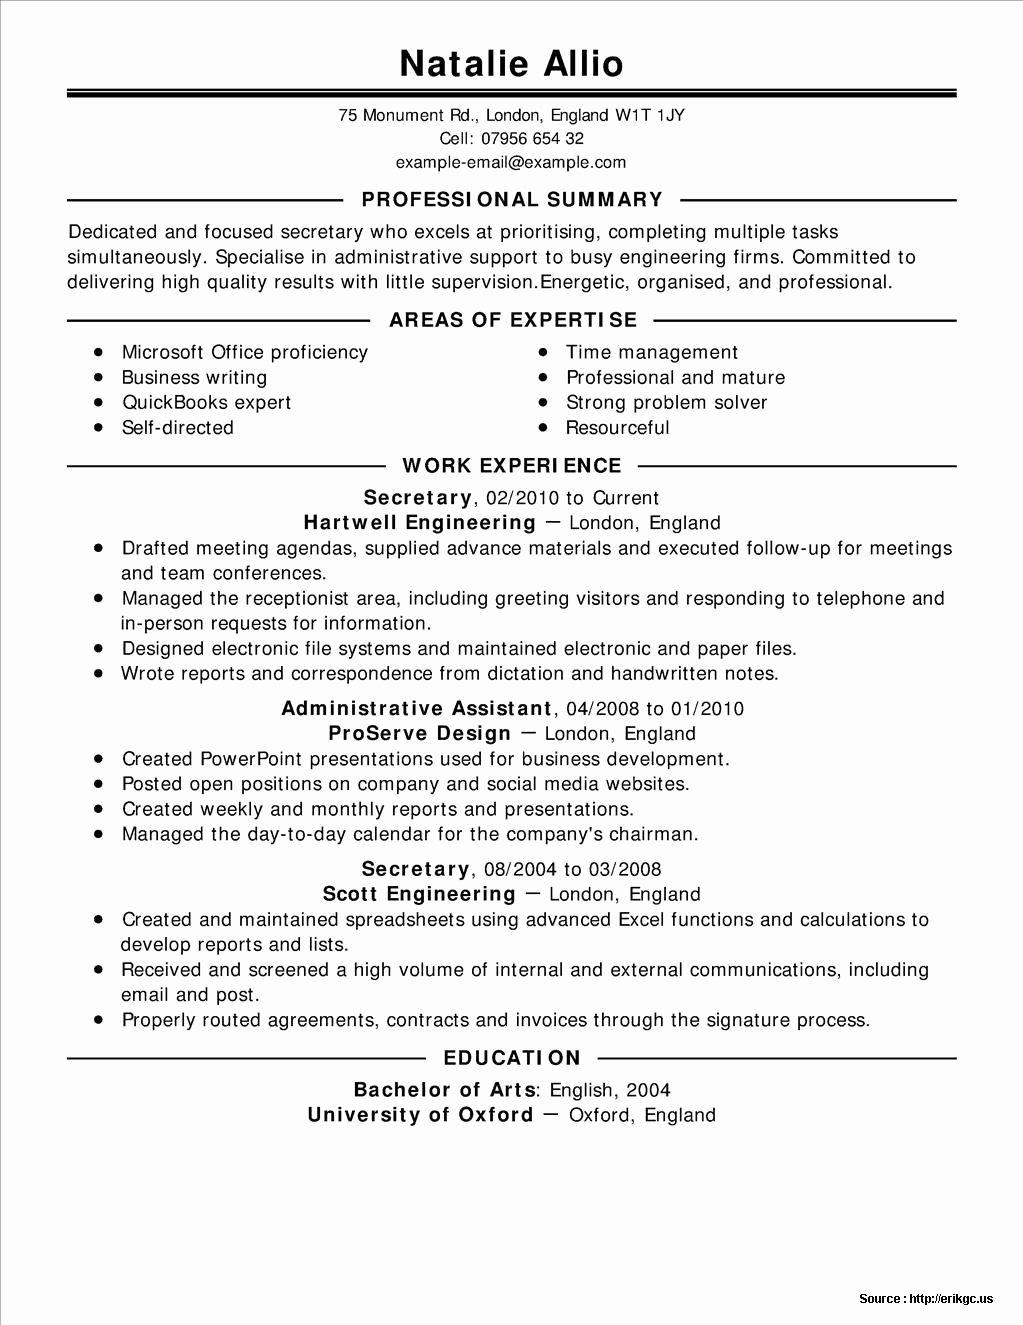 Free Resume Builder Download for Windows 8 Resume